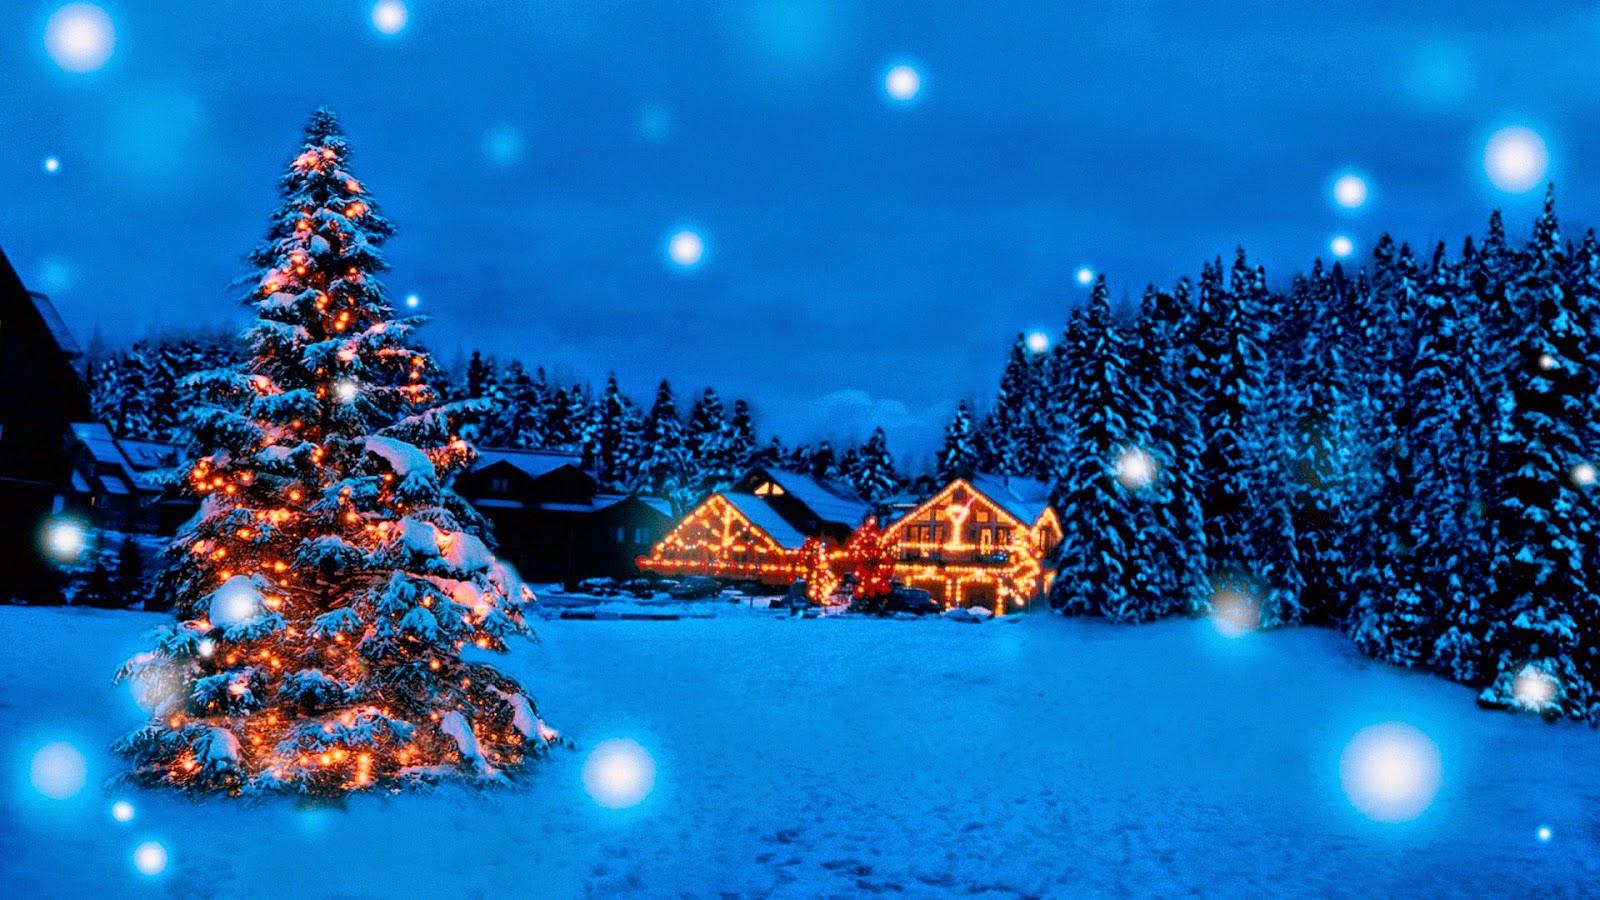 100% Desktop Quality HD Wallpapers 1080p Free Download: Top 23 Christmas Wallpaper HD Widescreen